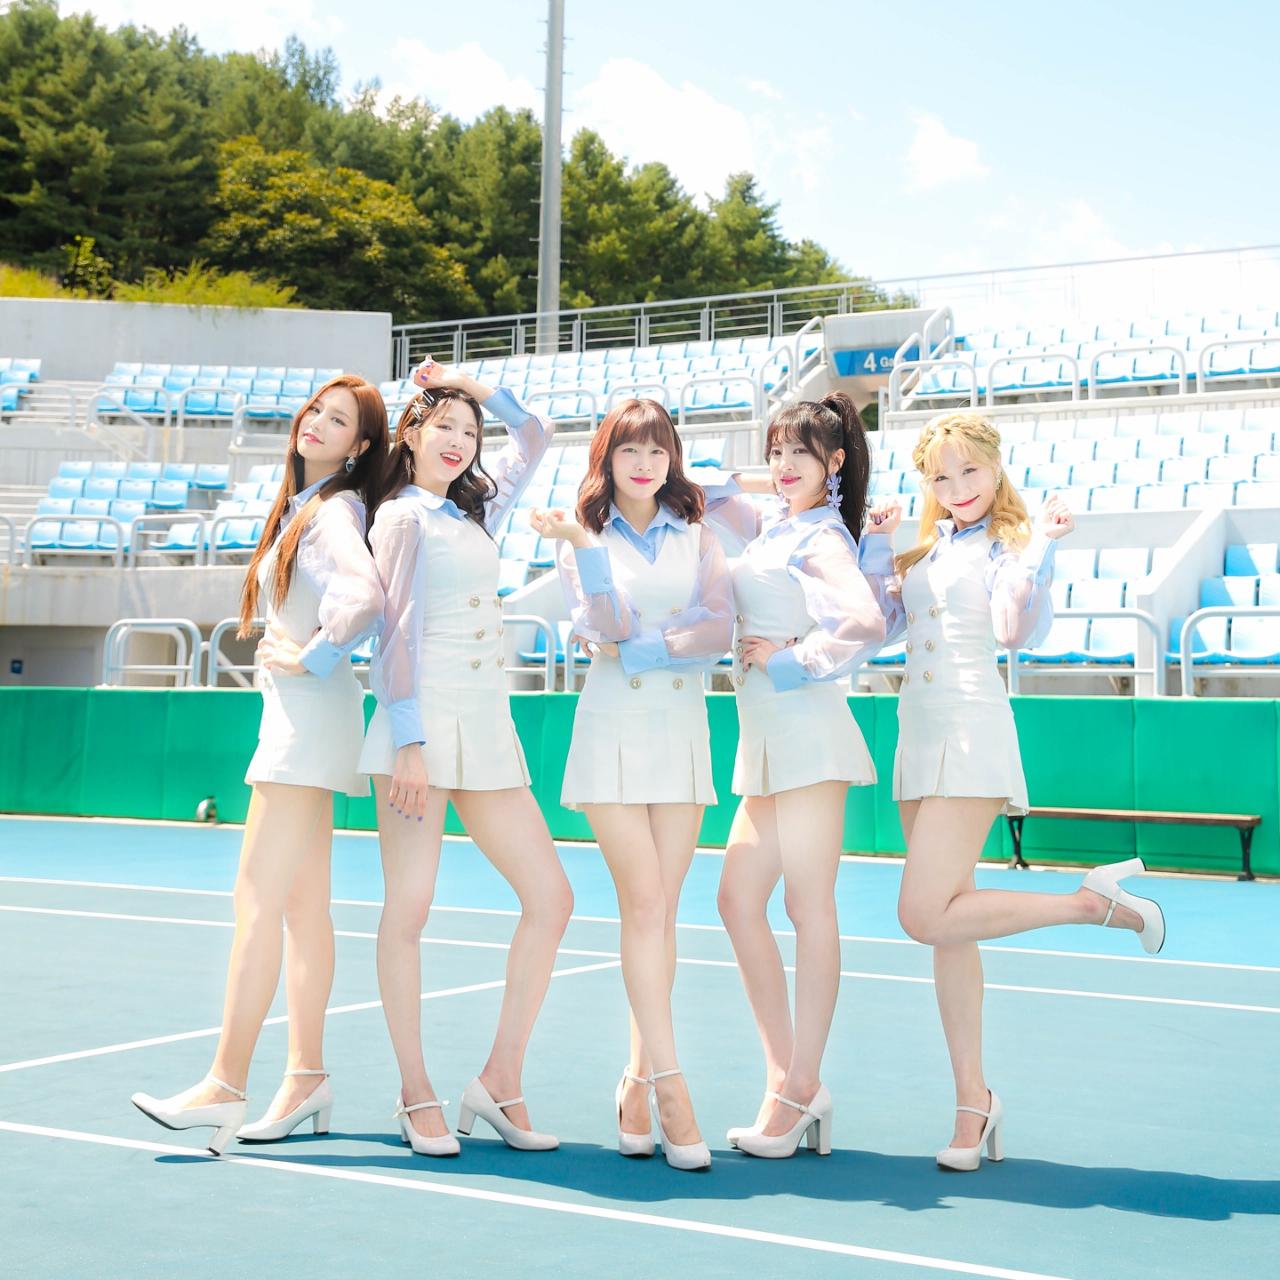 LABOUM:2014年8月デビュー。洗練されたビジュアルと、メンバー 全員が160cm以上という抜群のスタイルで話題をさらい、2ndミニ アルバムのタイトル曲「Hwi hwi」は人気音楽番組「ミュージックバンク」で2週連続1位を記録。今年11月「Hwi hwi」の日本語verをリリースし待望の日本デビュー。口笛の音と、歌詞とシンクロした キュートな振付けに注目!